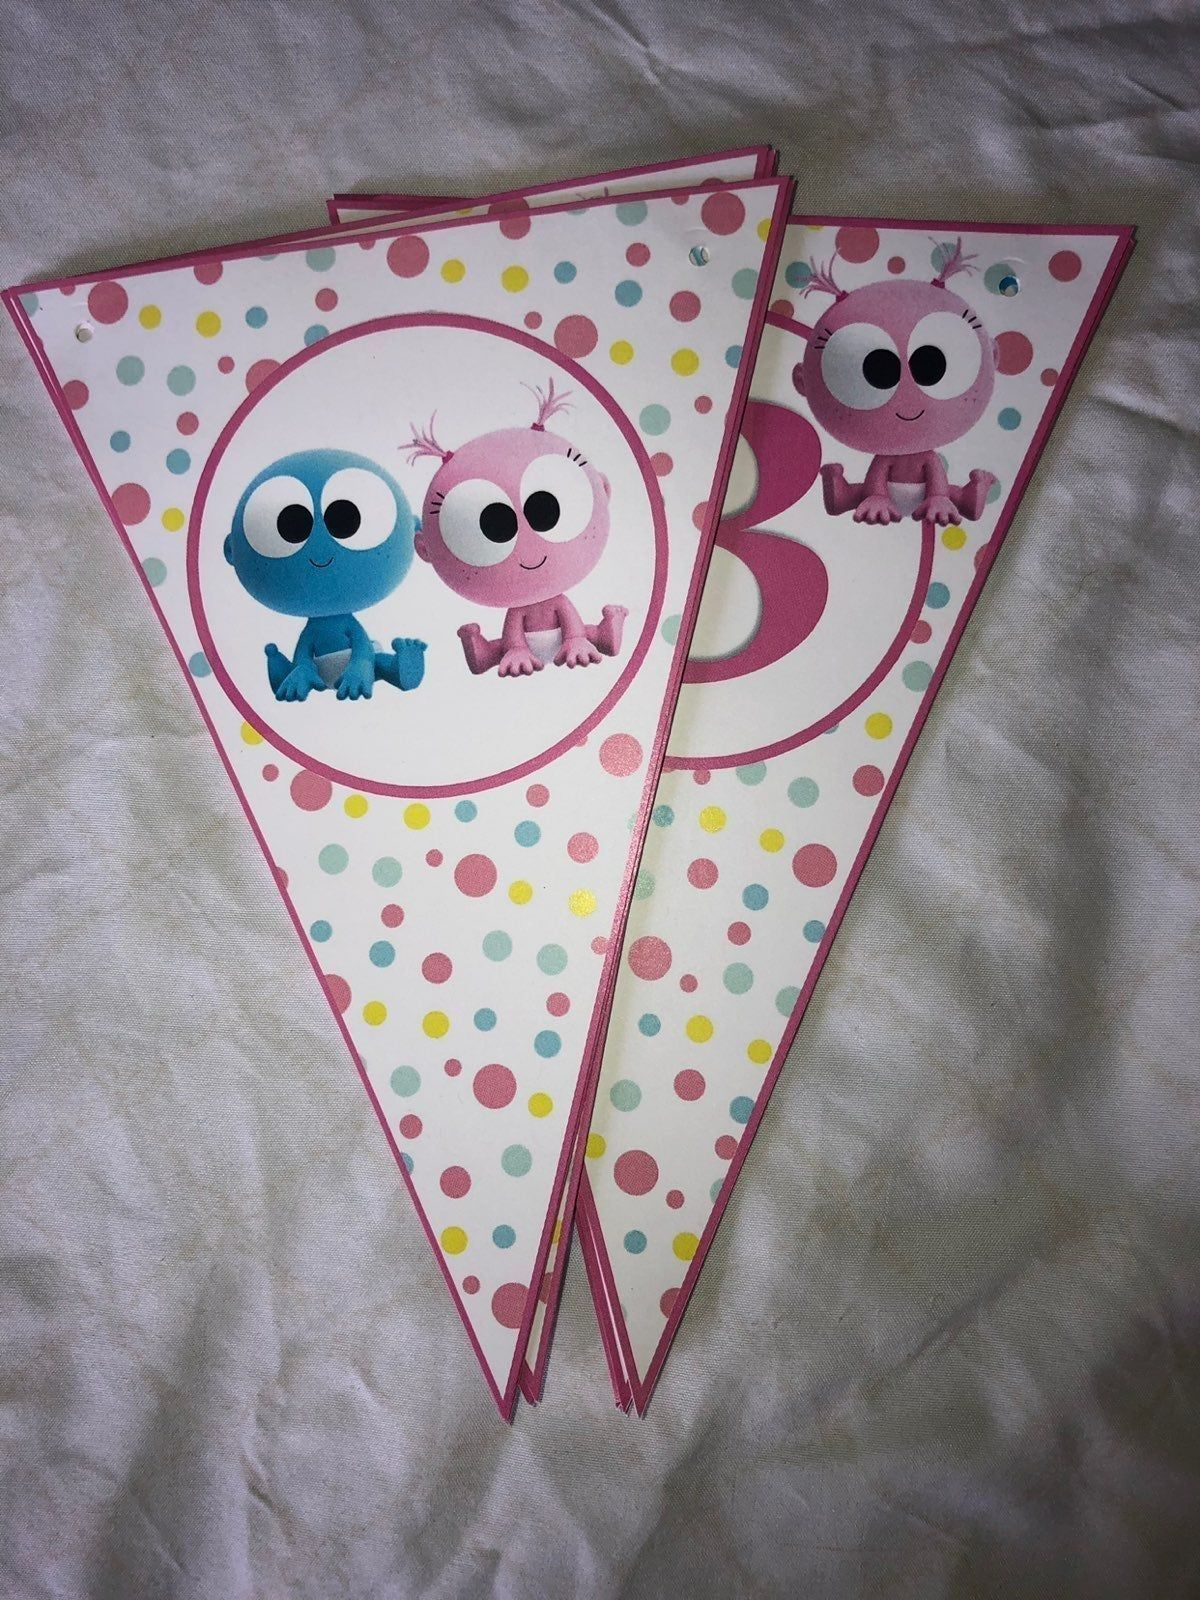 Goo Goo And Gaa Gaa : BabyFirst, Banner, Happy, Birthdays,, Birthday, Banners,, Daughter